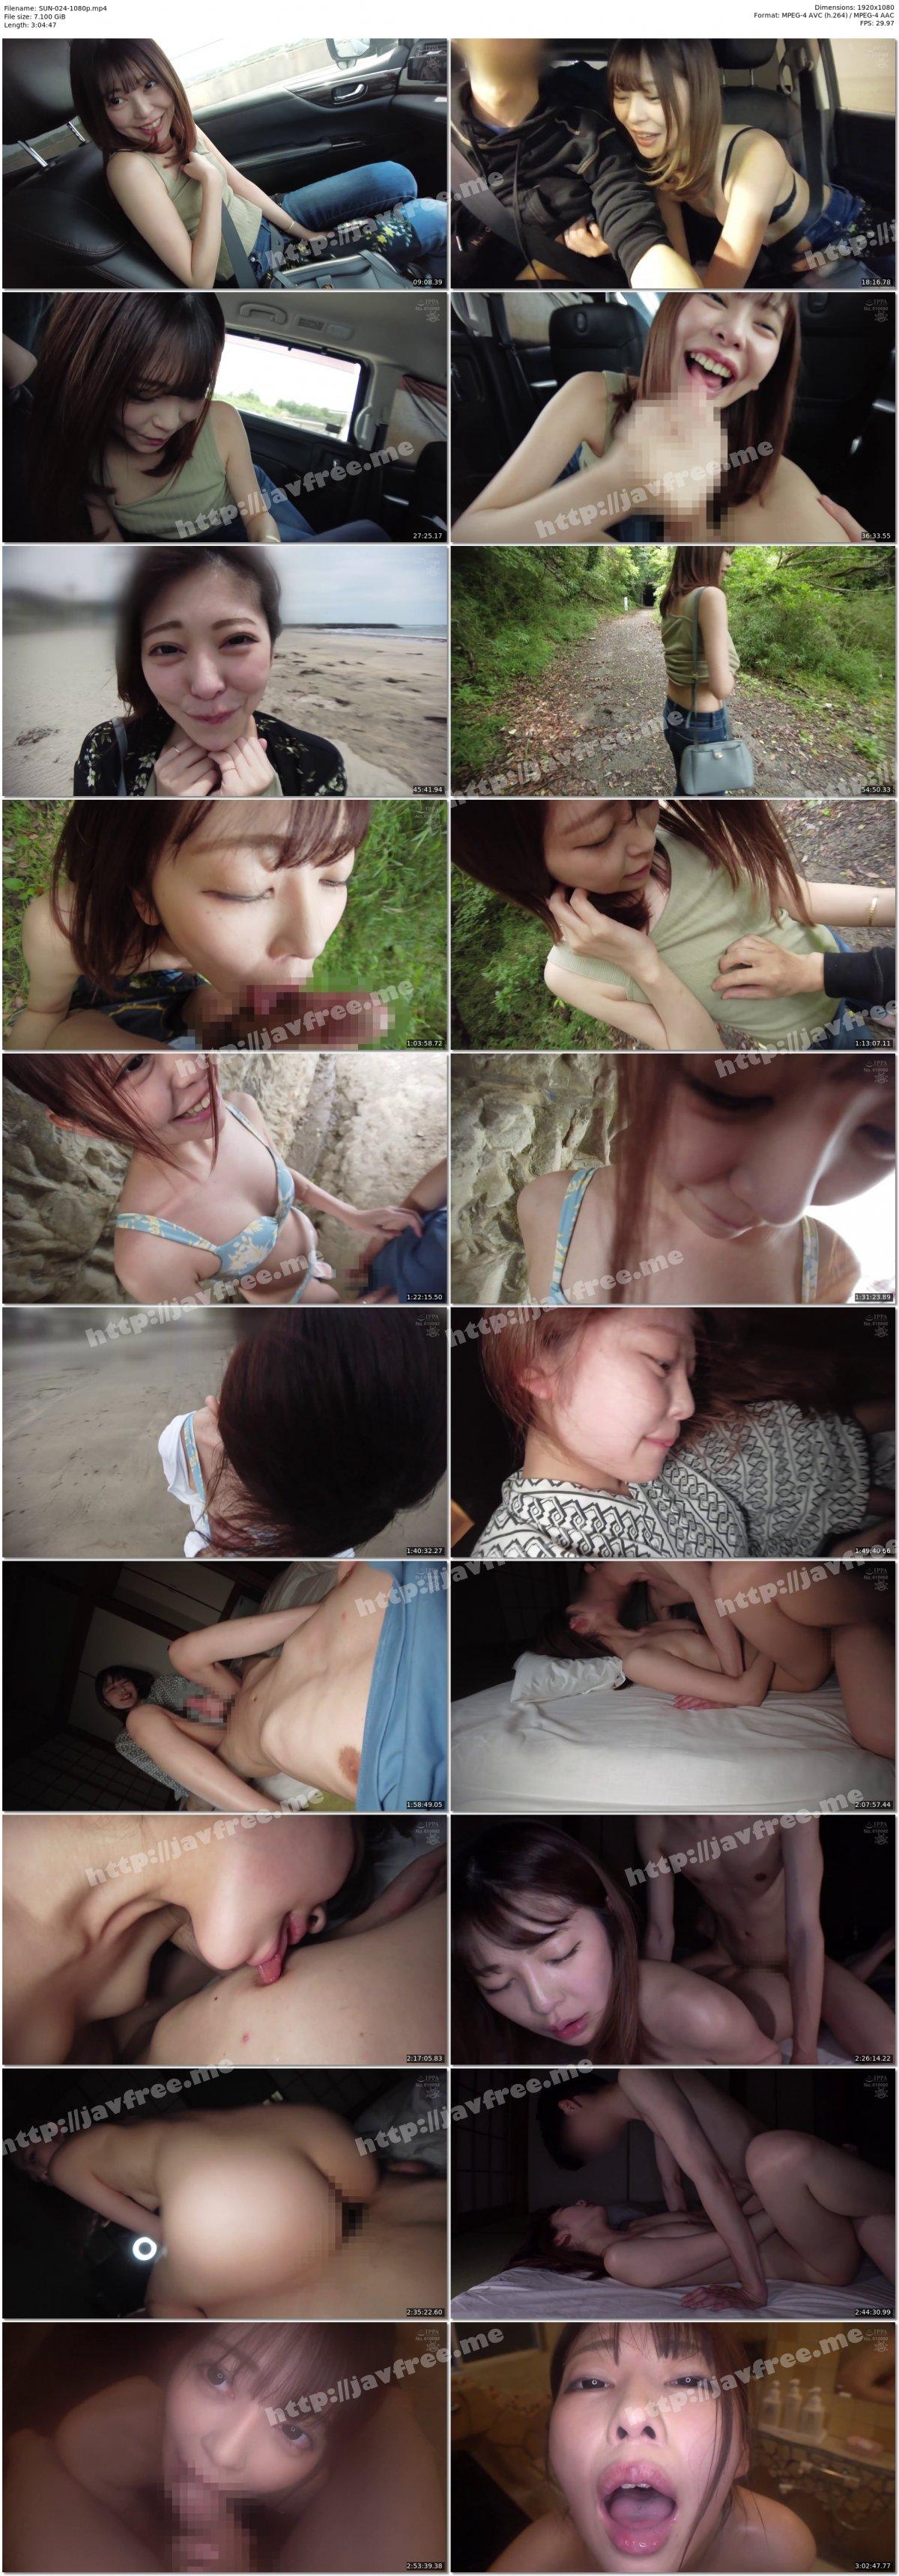 [HD][SUN-024] 美顔精飲 仕事が休みの火曜日、露出デートで中出しと精子を飲みまくった記録 - image SUN-024-1080p on https://javfree.me